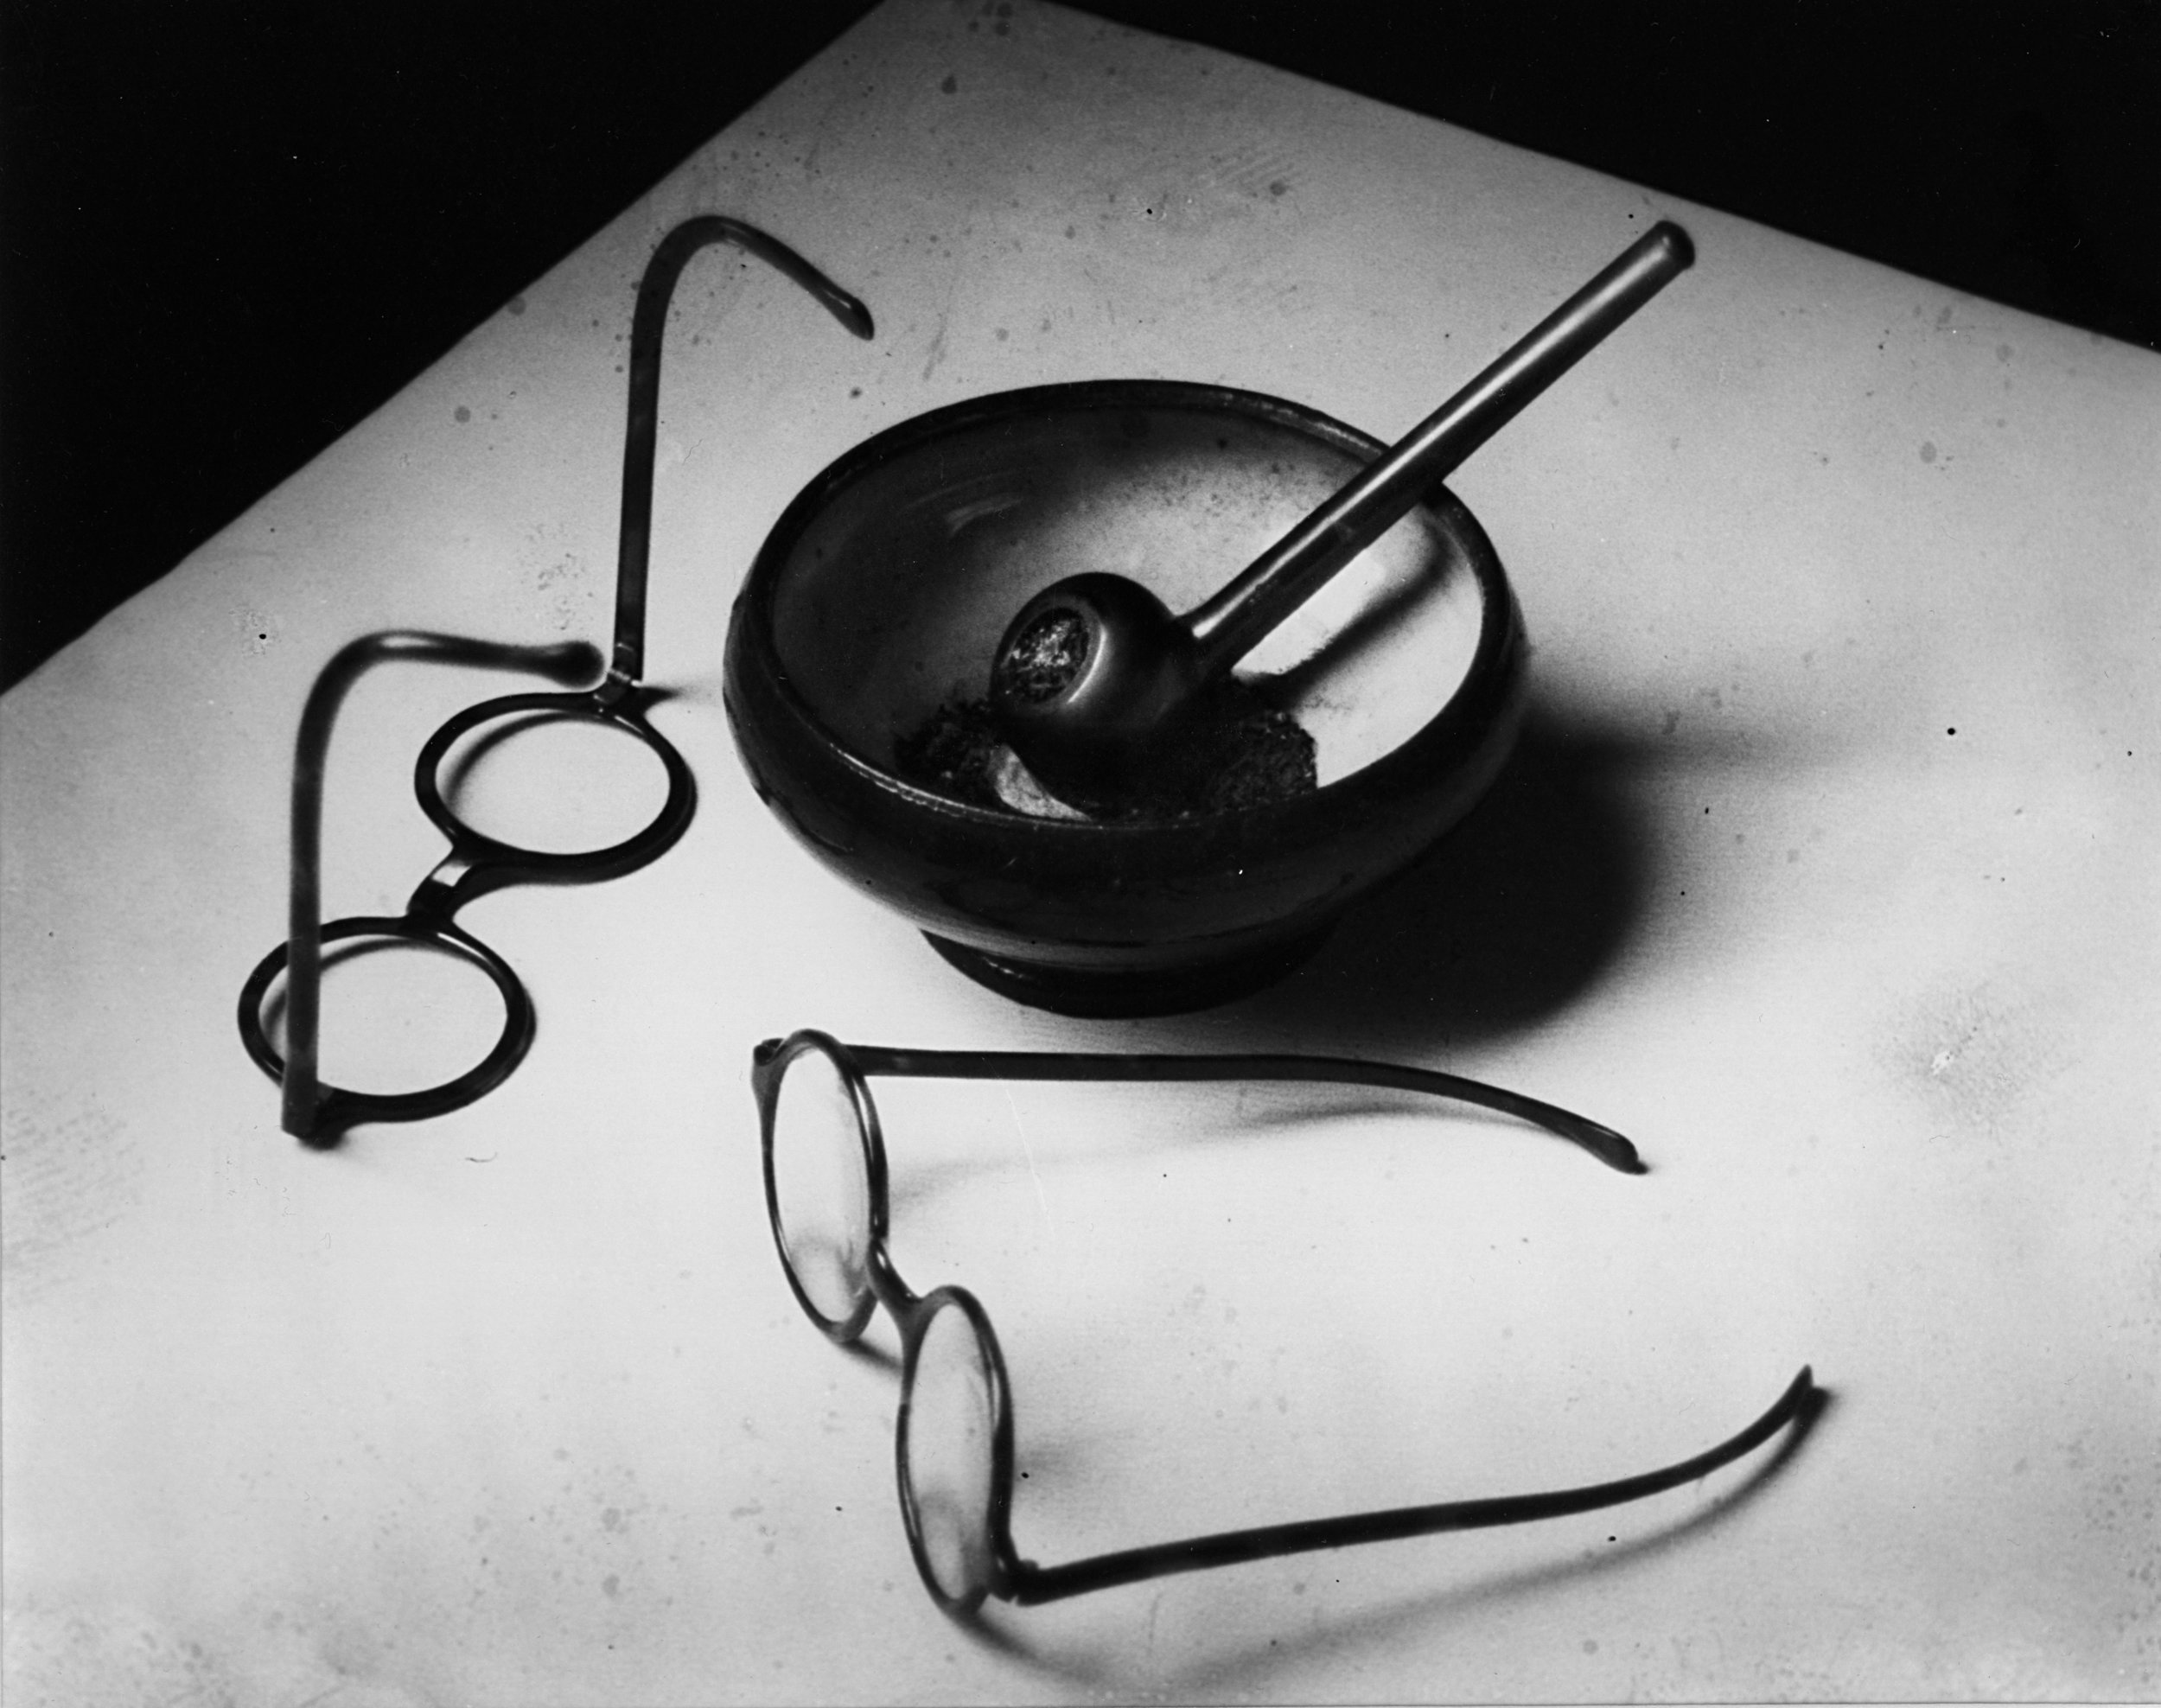 ANDRE KERTESZ, Mondrian's Glasses and Pipe, Paris, 1926